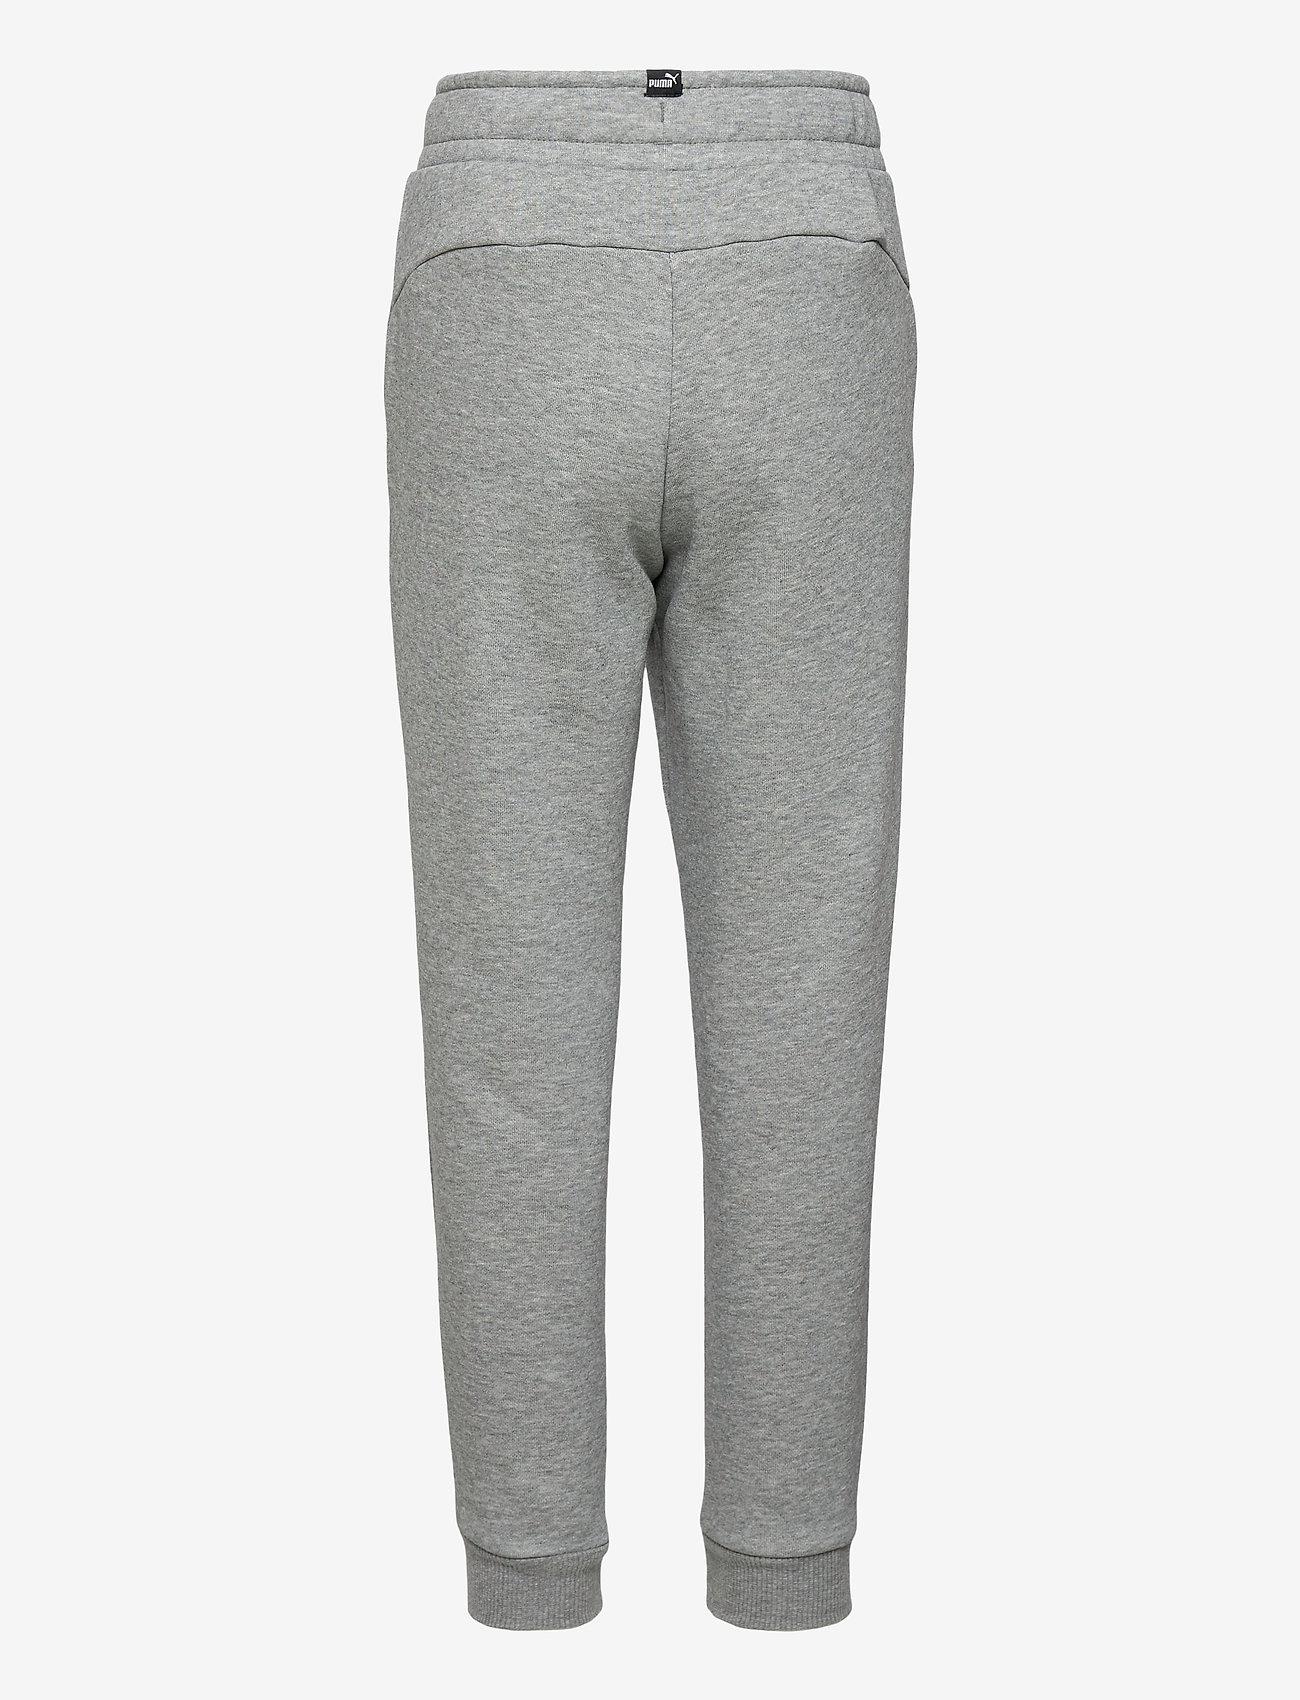 PUMA - ESS Logo Pants FL cl B - sportunderdelar - medium gray heather-cat - 1